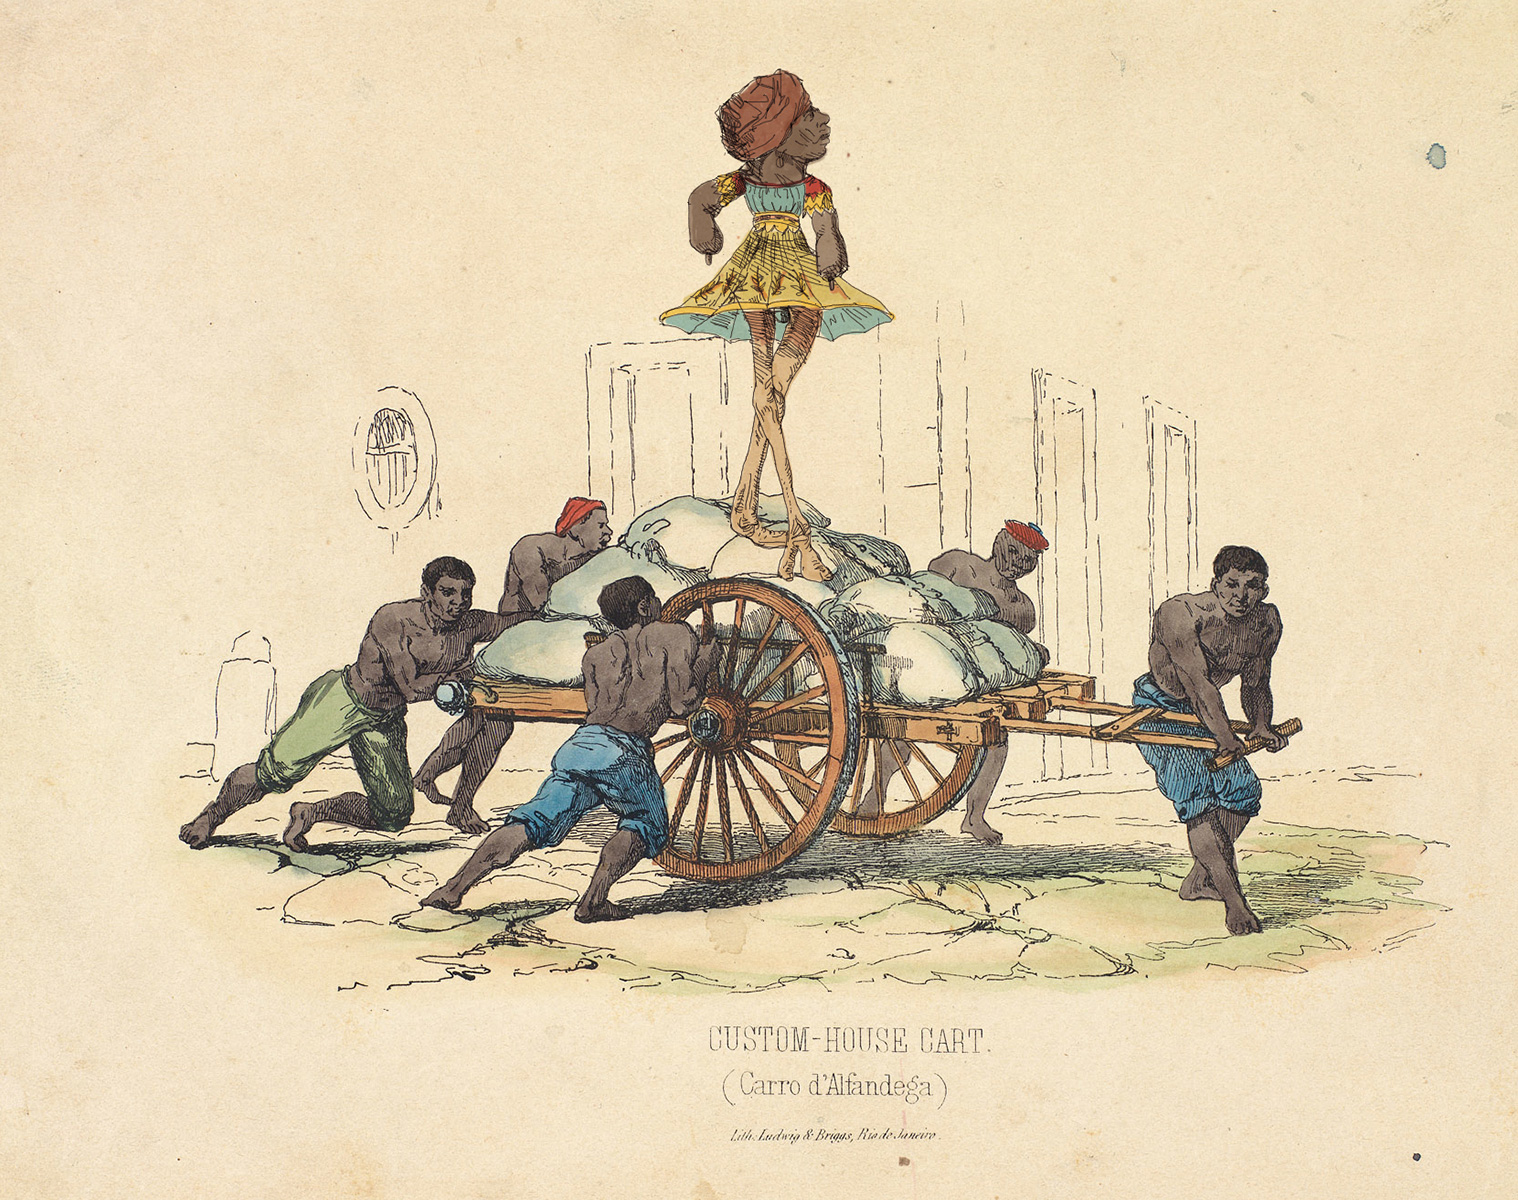 Gravura atribuída a Frederico Guilherme Briggs - Impressão Giclée - 18 cm x 23 cm